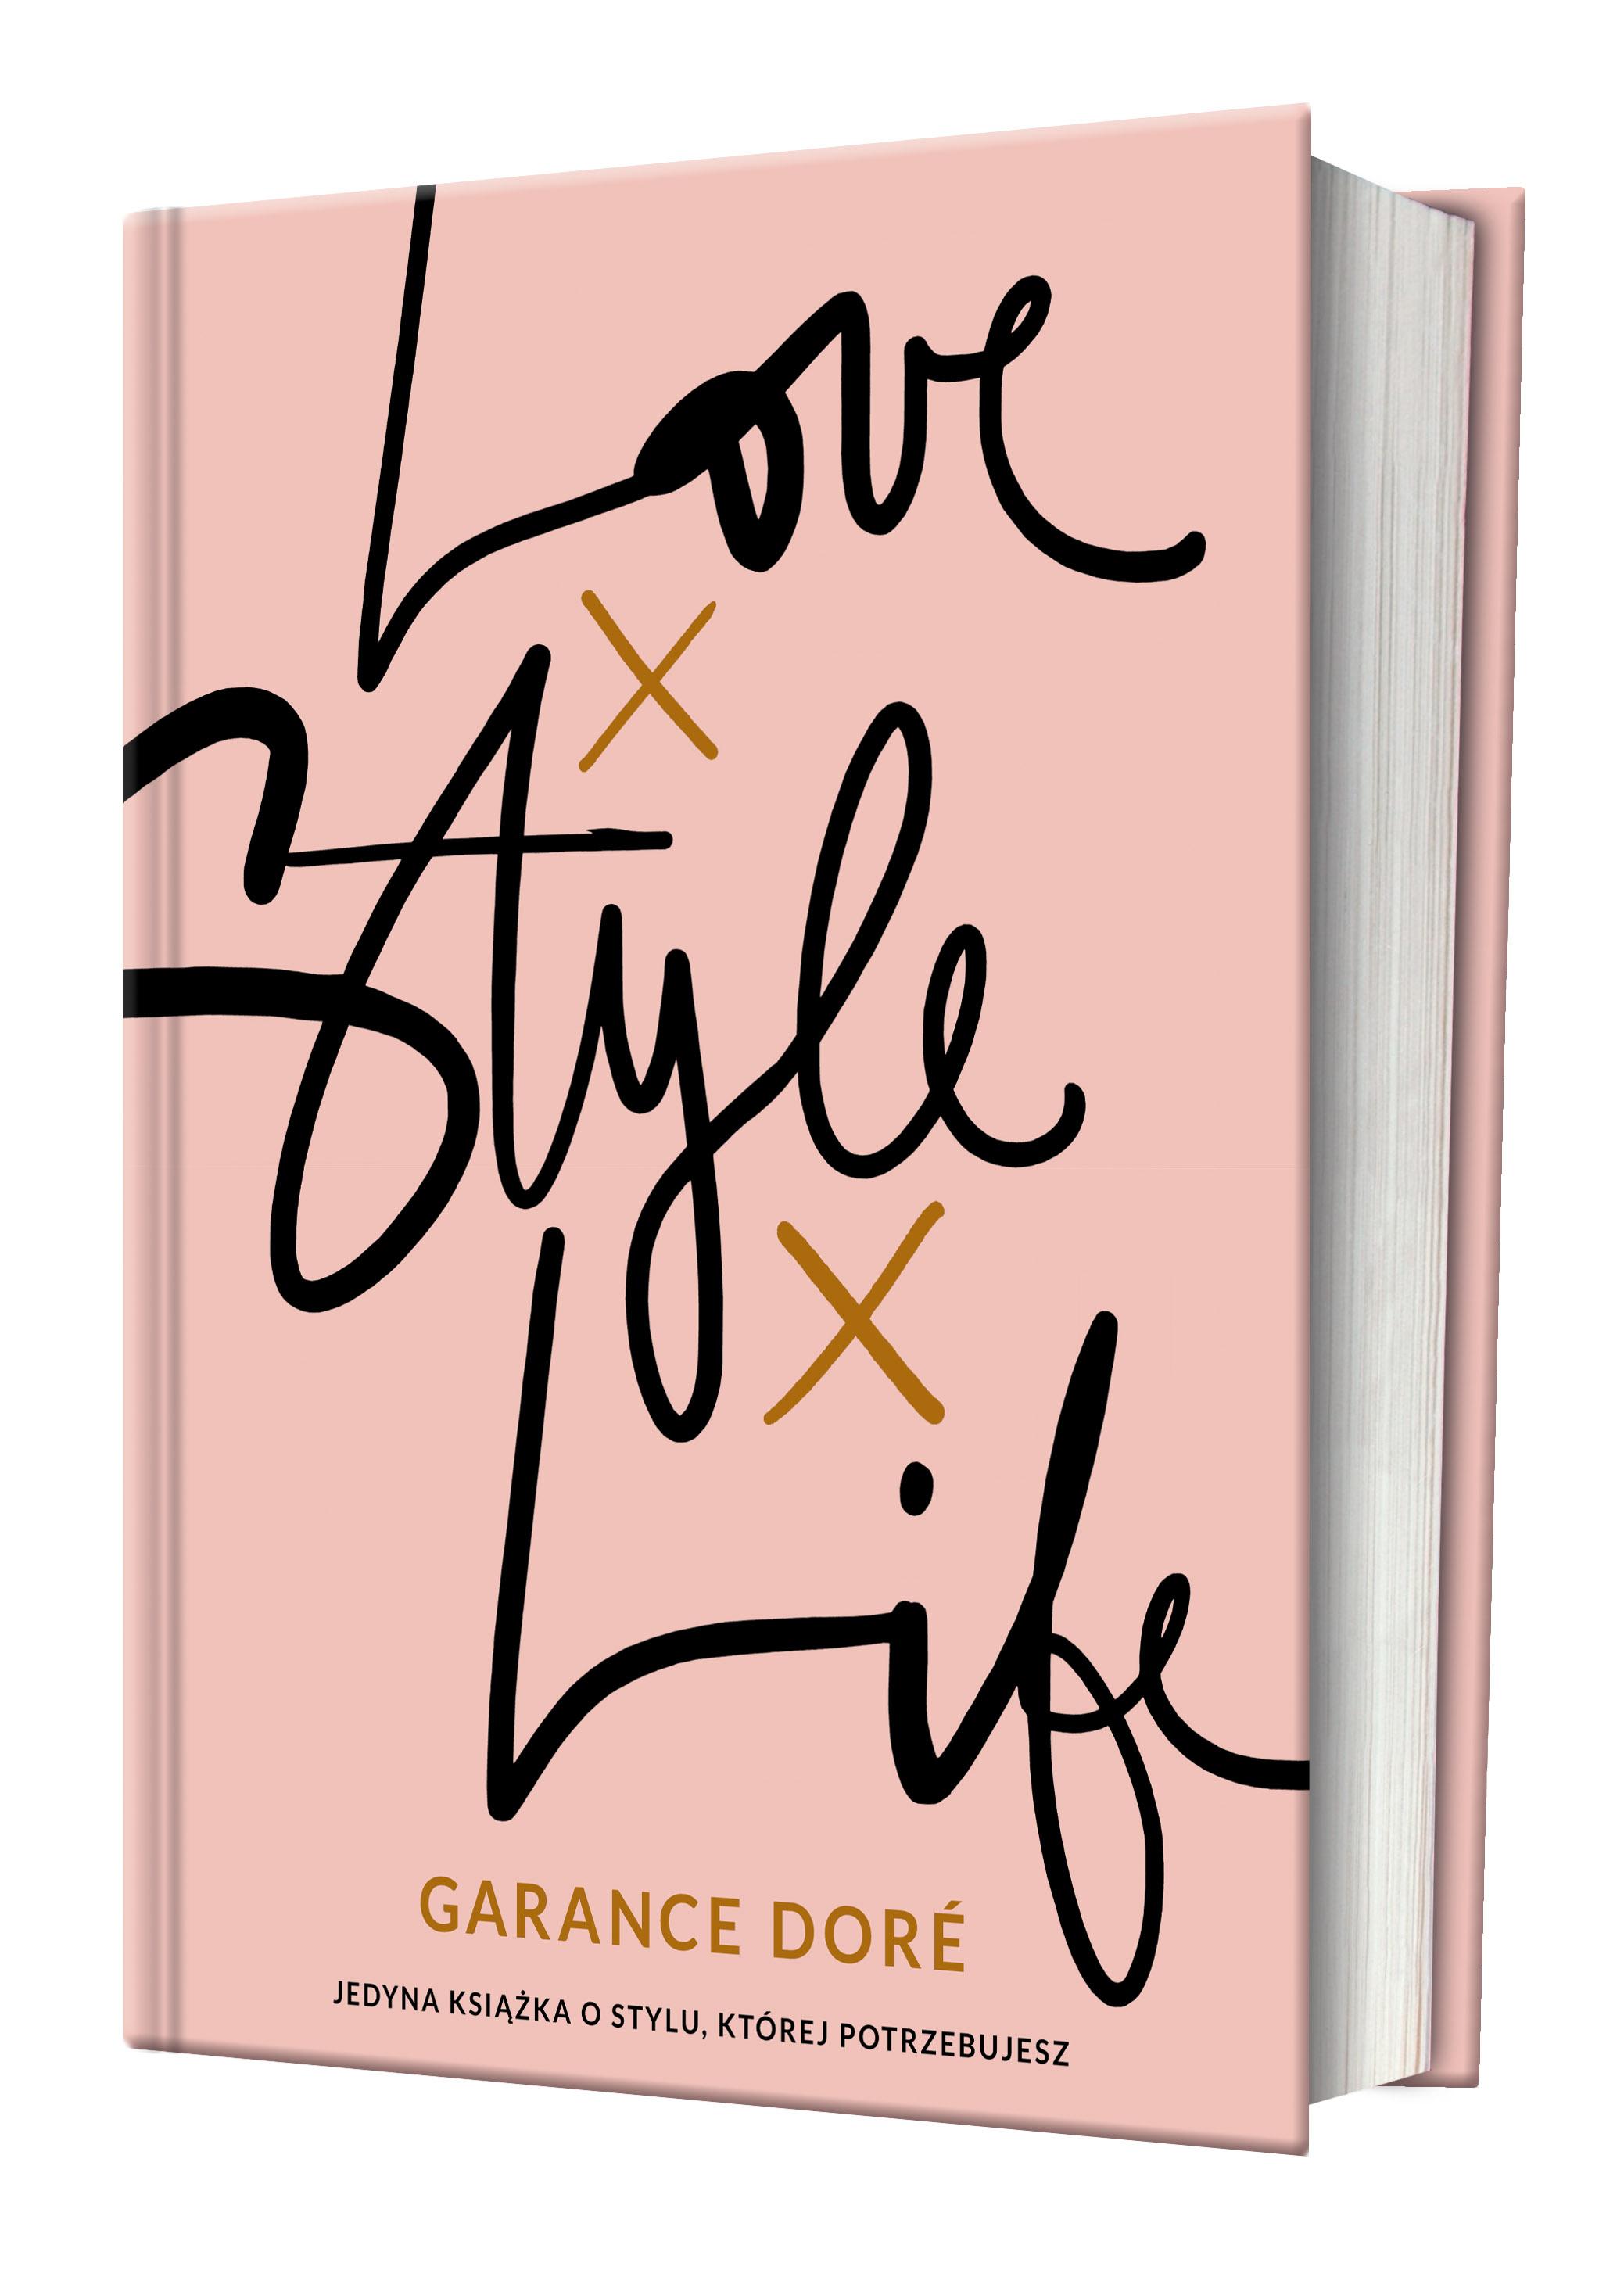 Dore_Love,Style,Life_3D. Garance Dore, \u201eLove x